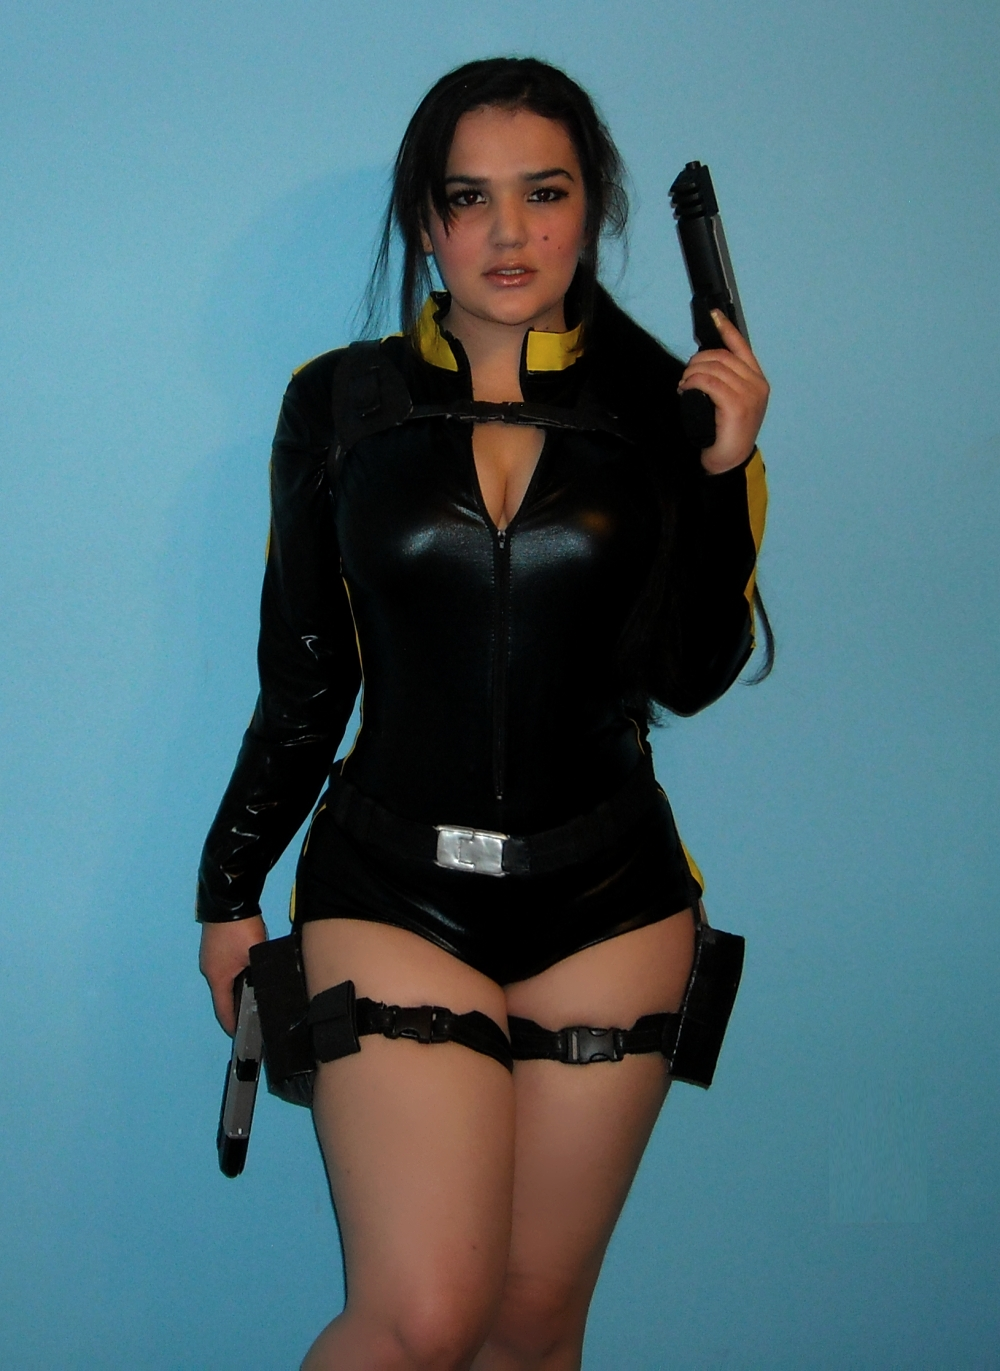 Lara croft underworld bikini breasts exploited pic